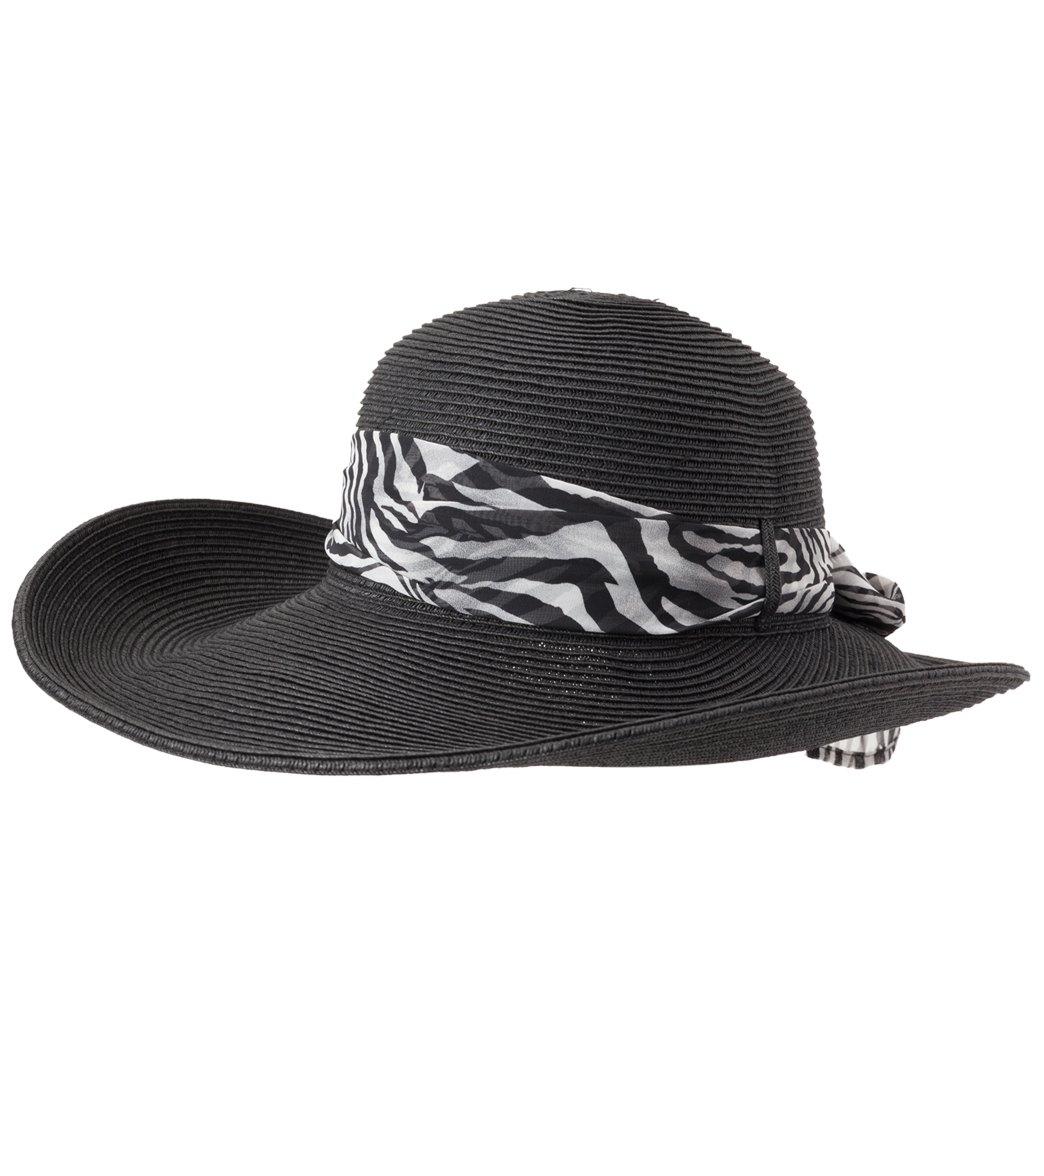 ff400b4a Sun N Sand Women's Paper Braid Hat at SwimOutlet.com